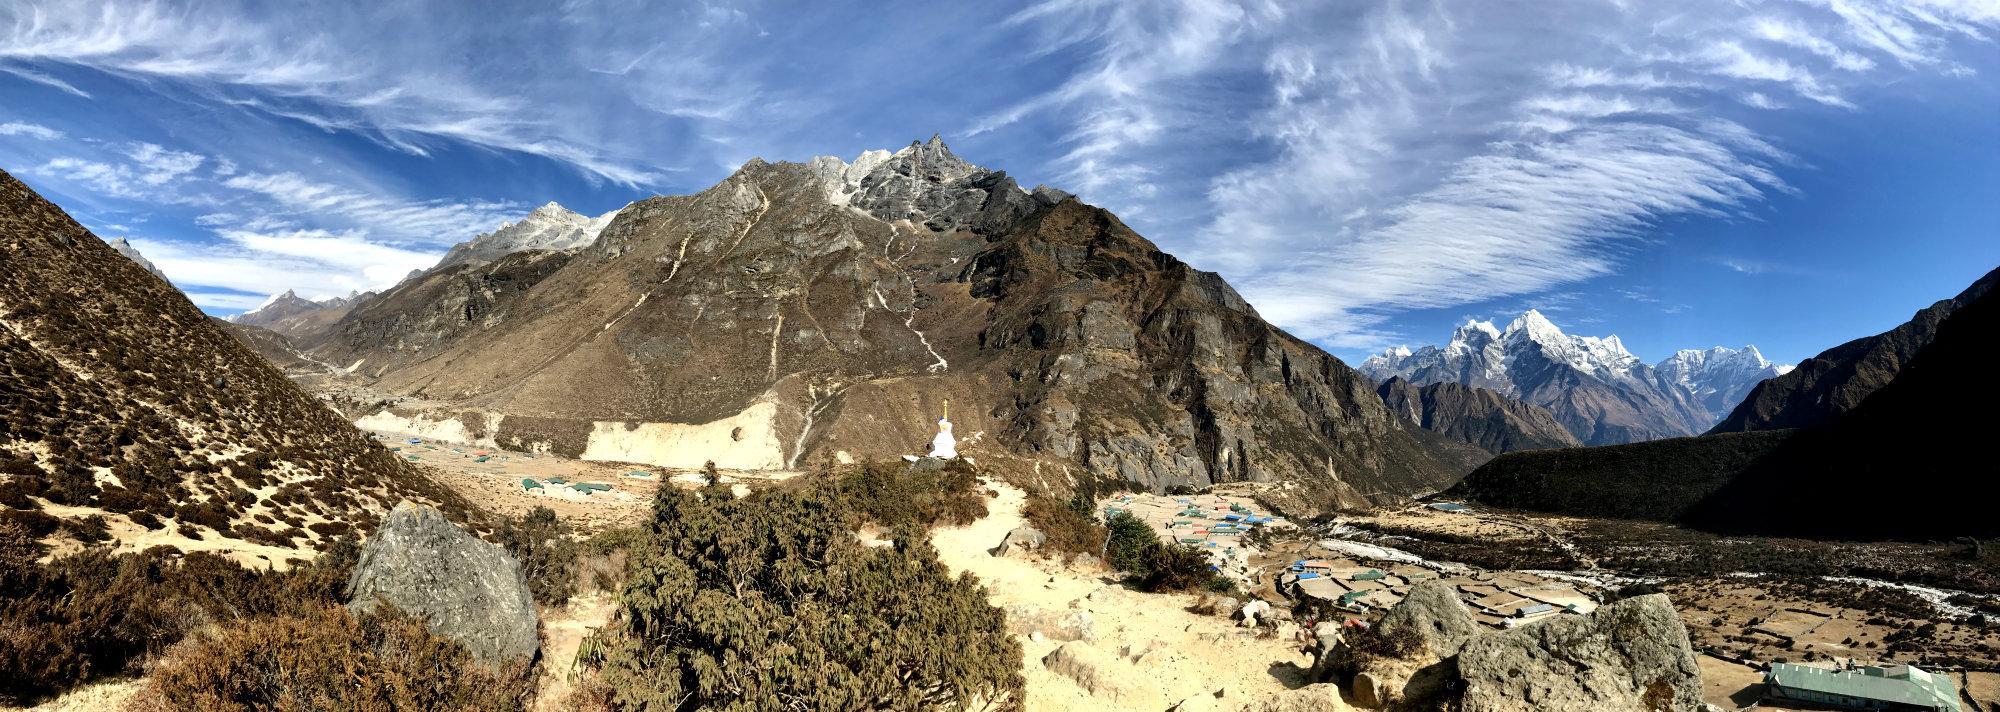 View over Thame Panorama.jpg